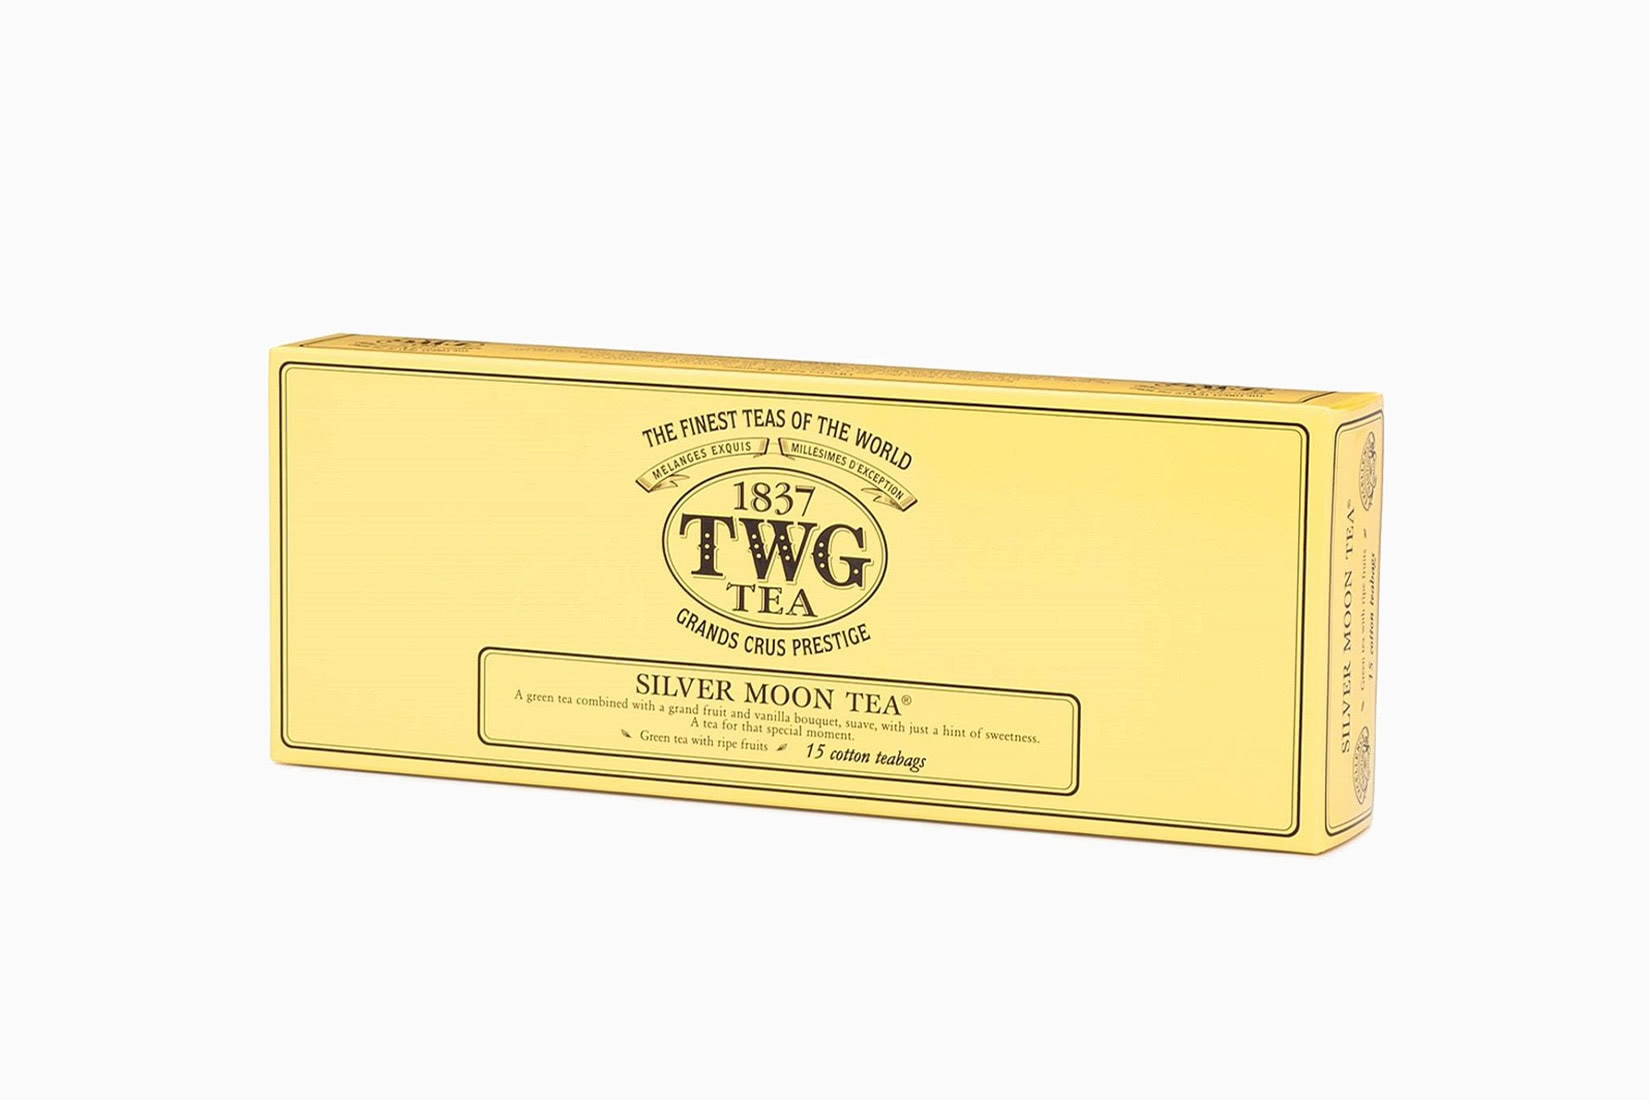 best tea brands luxury twg silver moon - Luxe Digital